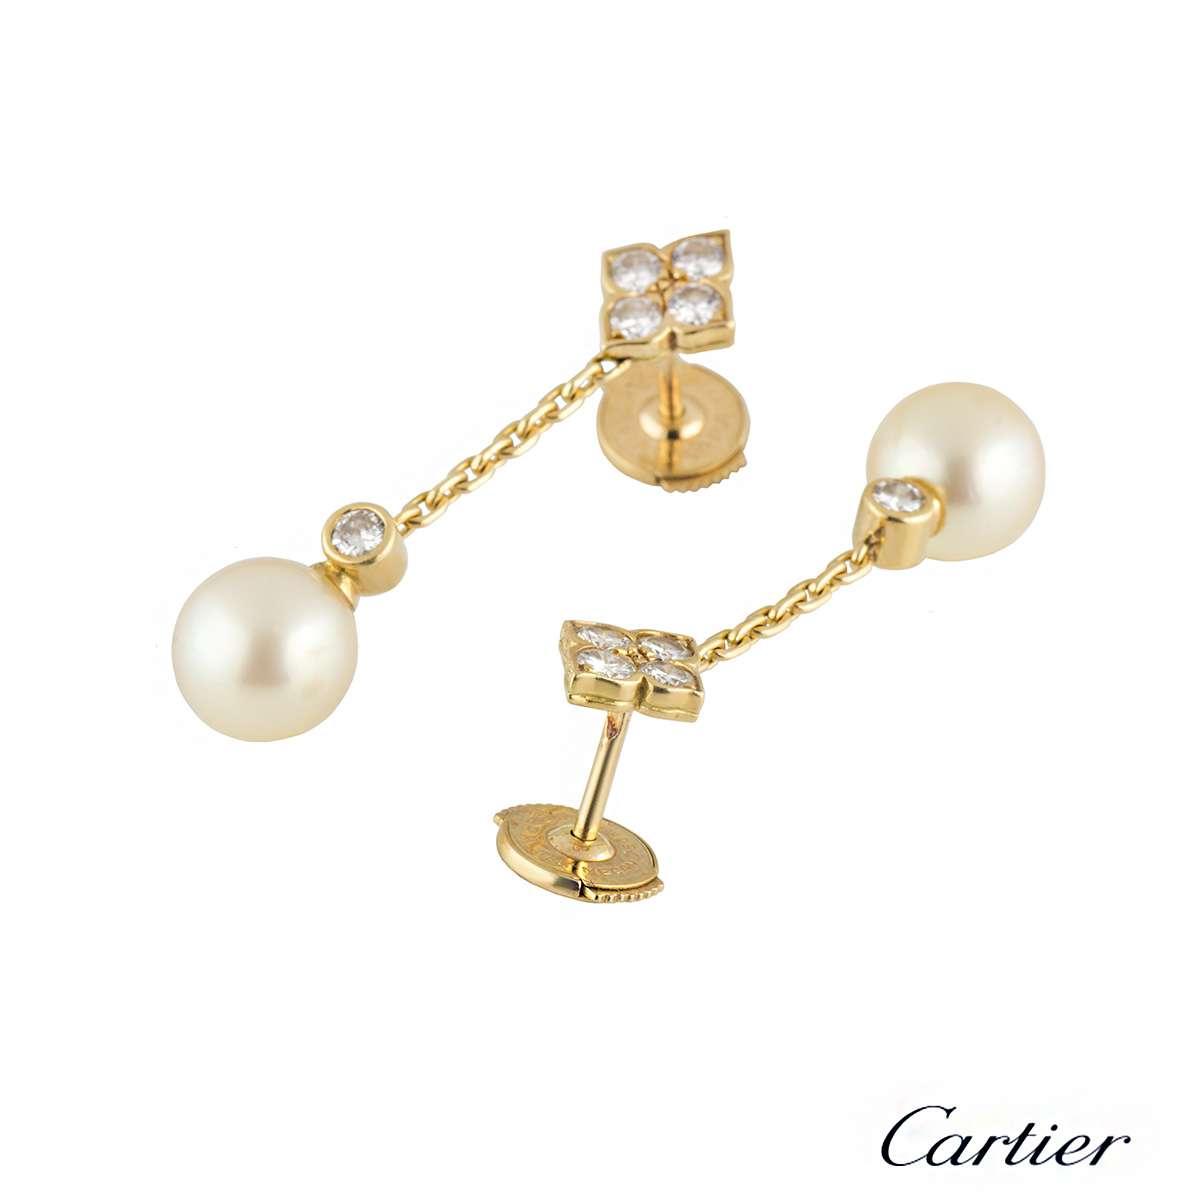 cartier 18k yellow gold diamond amp pearl drop earrings